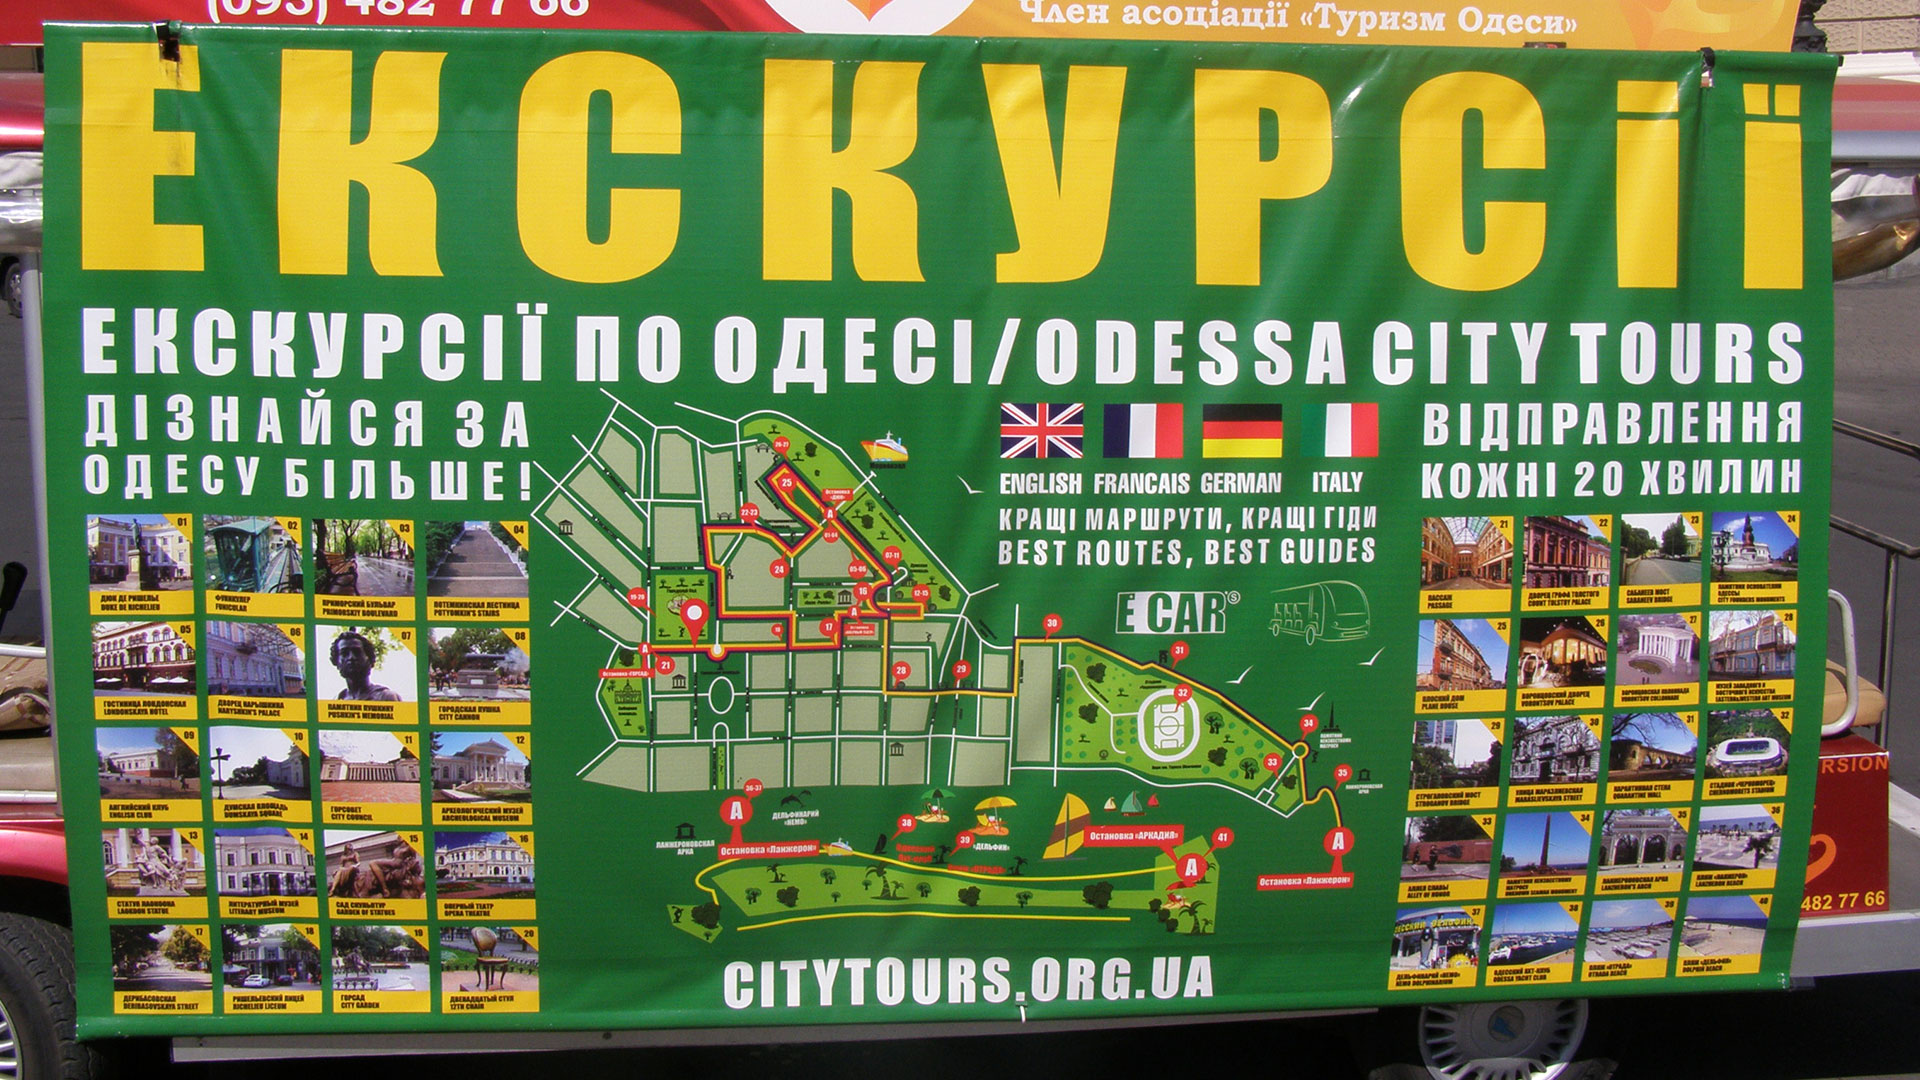 Реклама на экскурсионных электромобилях - City Tours Odessa